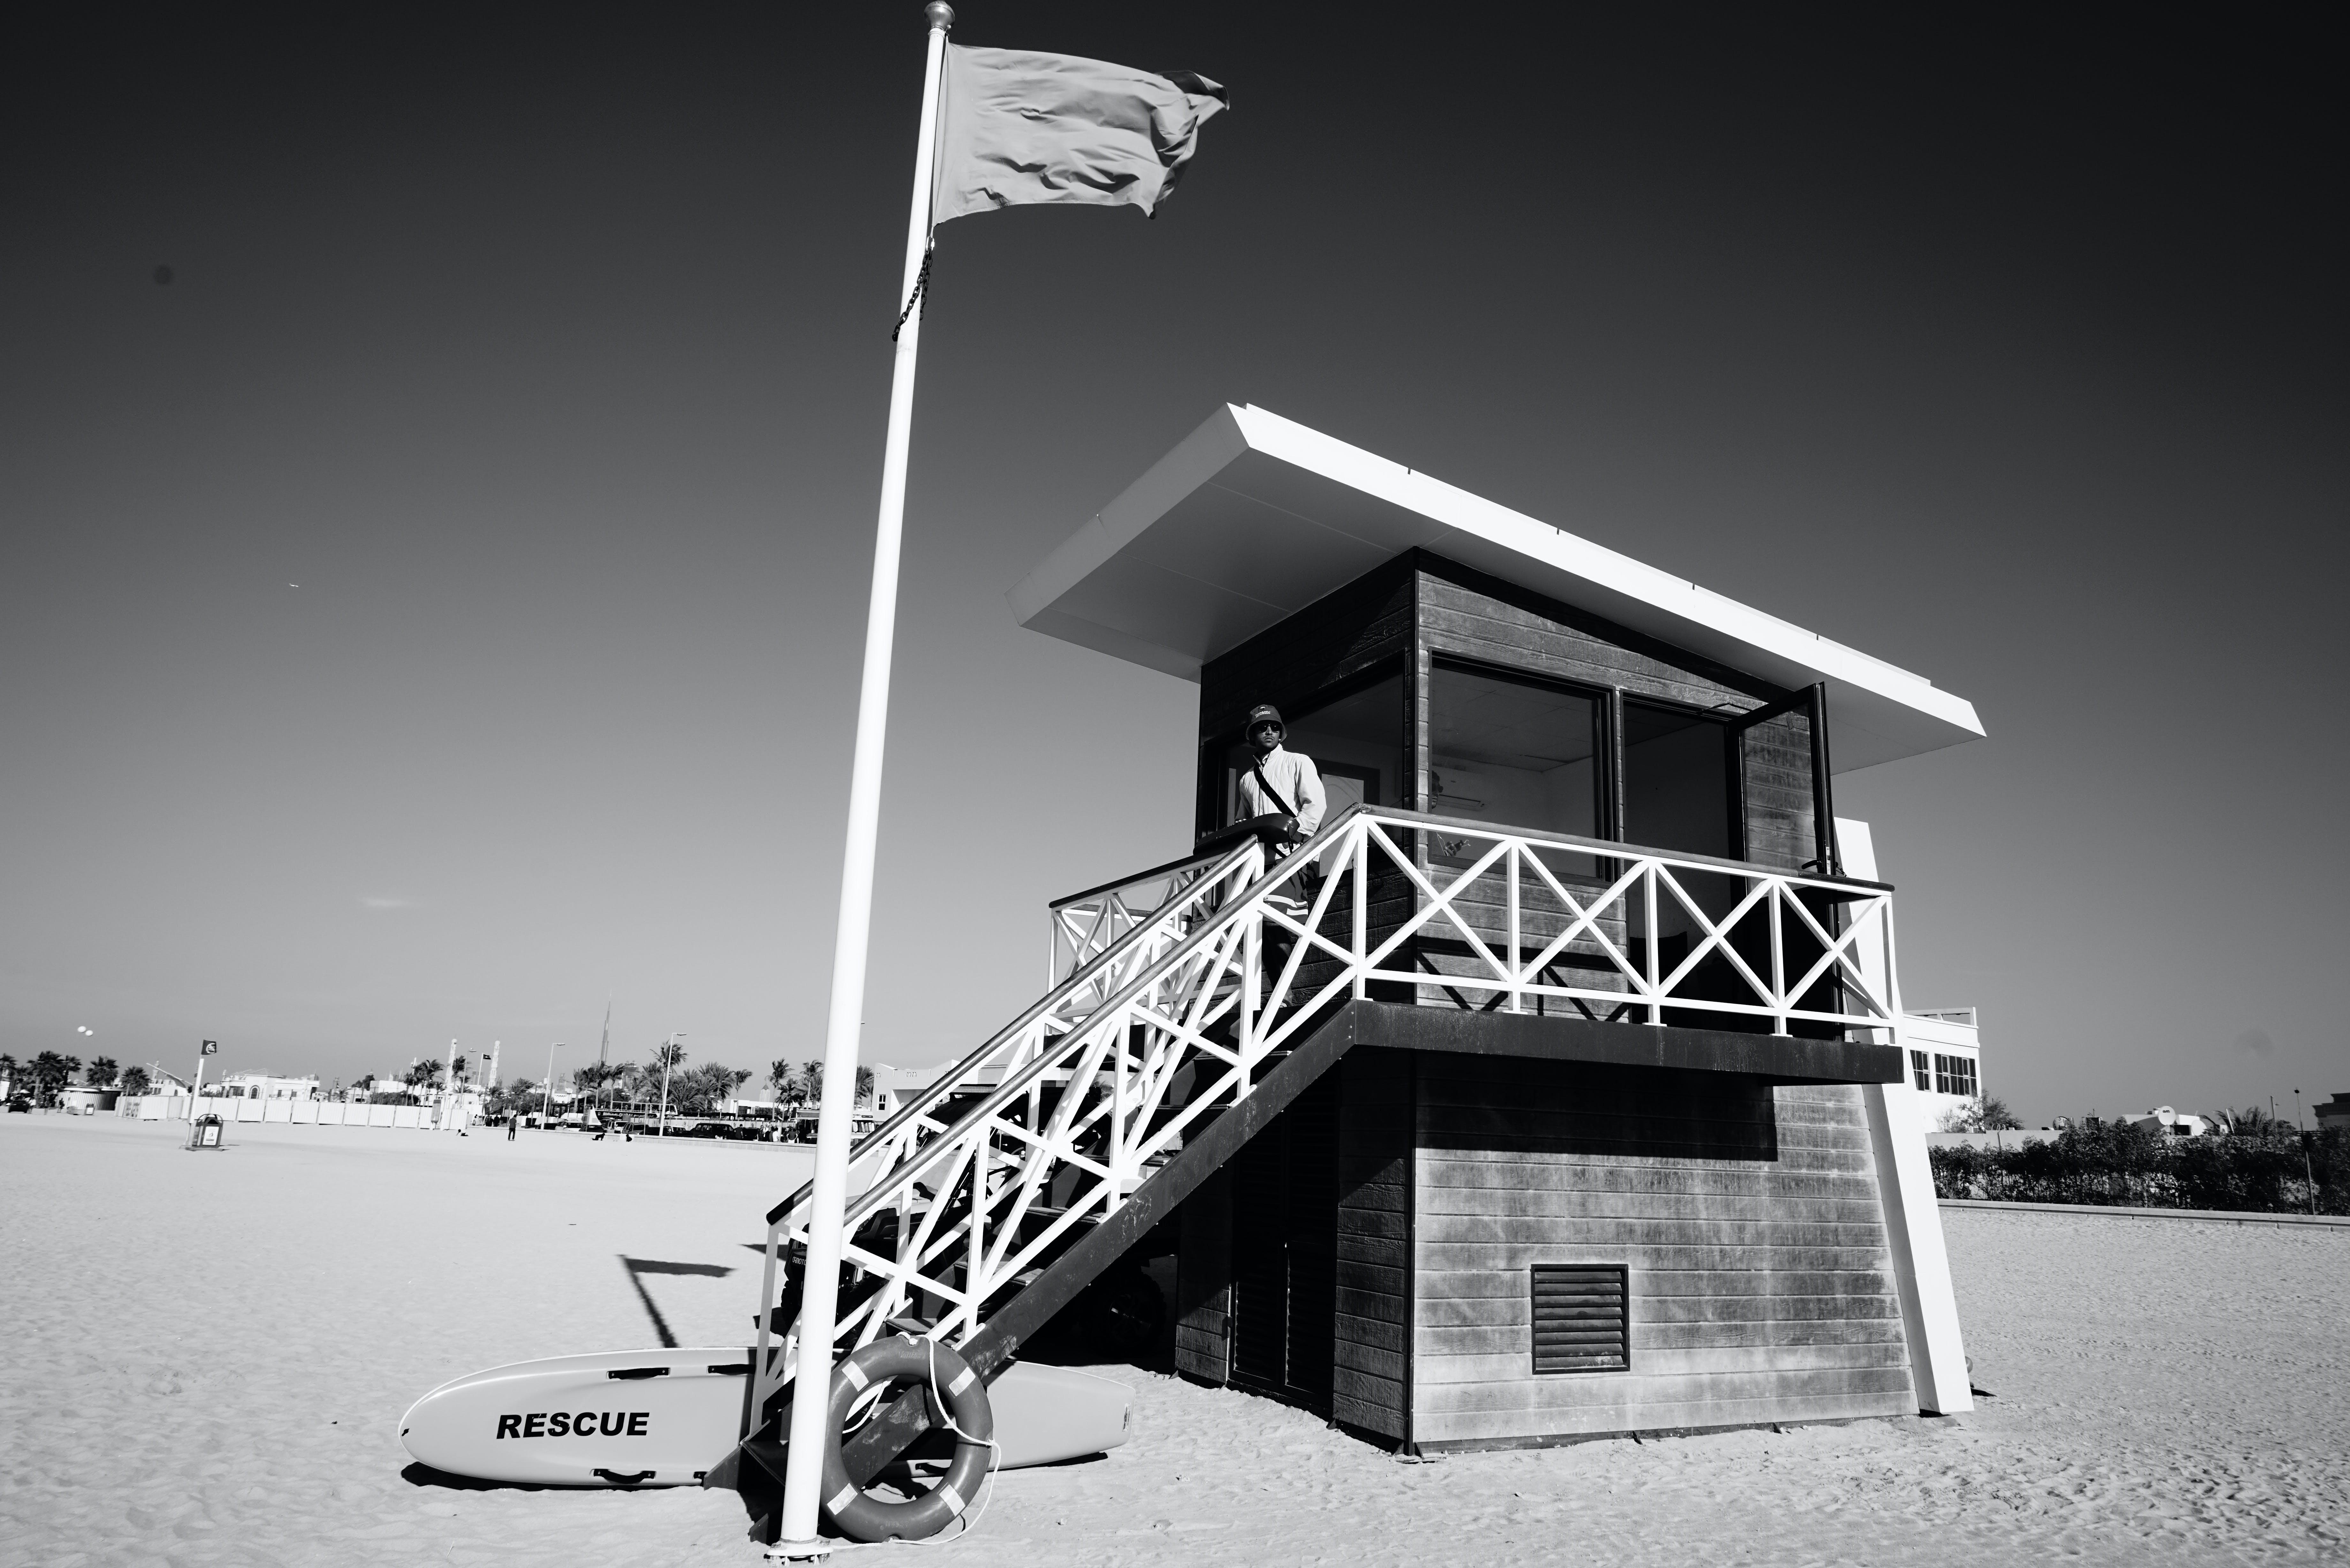 Free stock photo of lifeguard